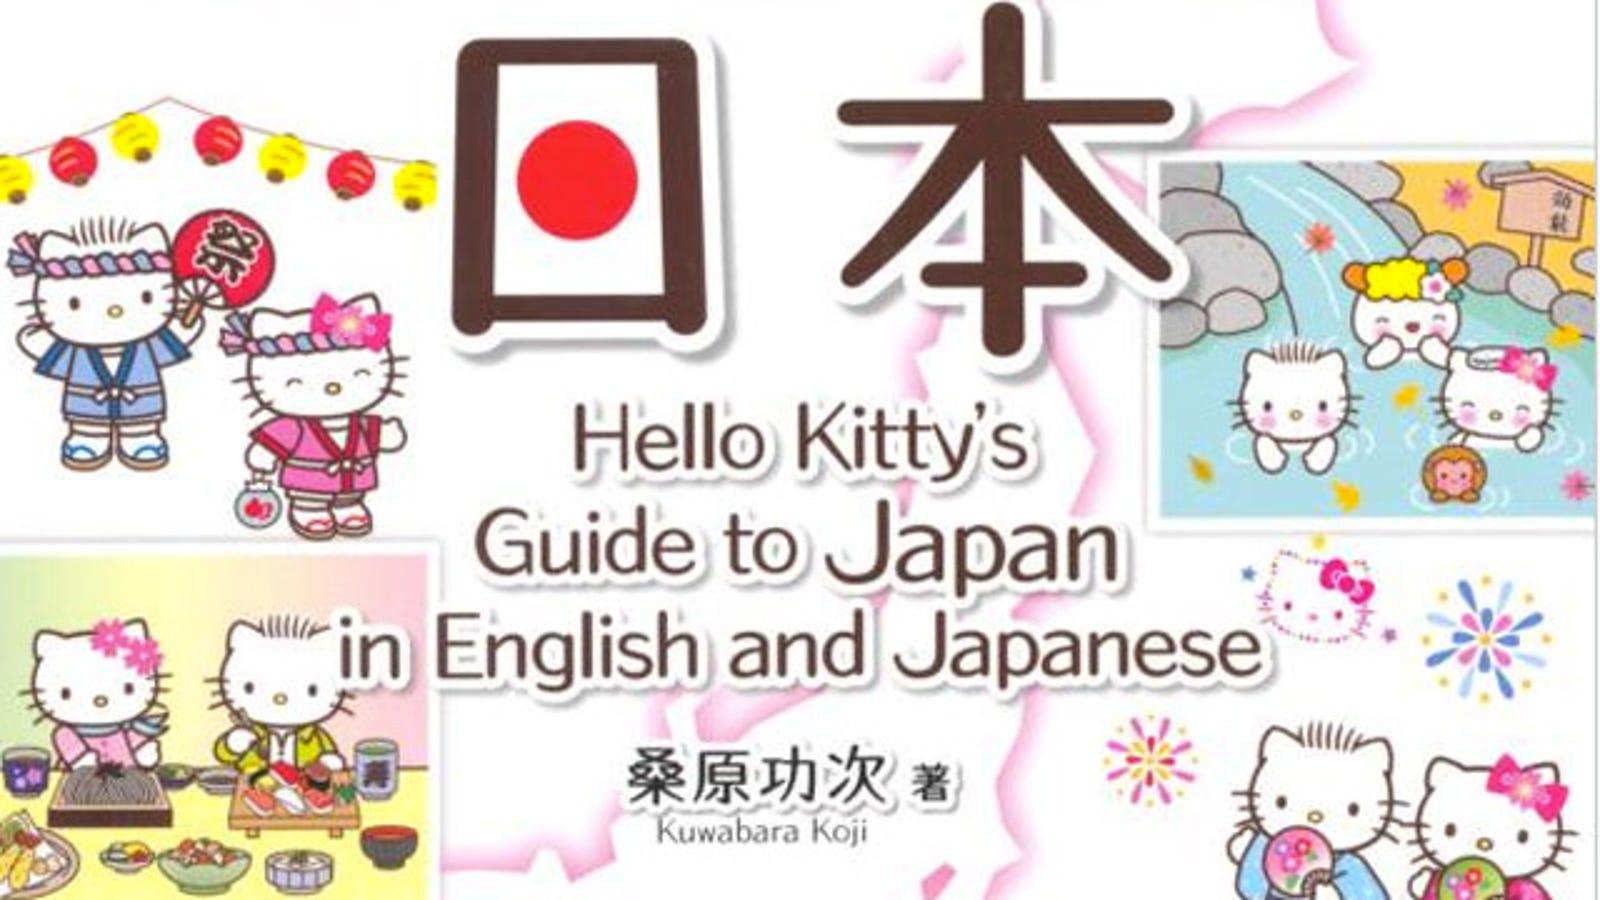 What Dark Secrets Has Hello Kitty Been Hiding